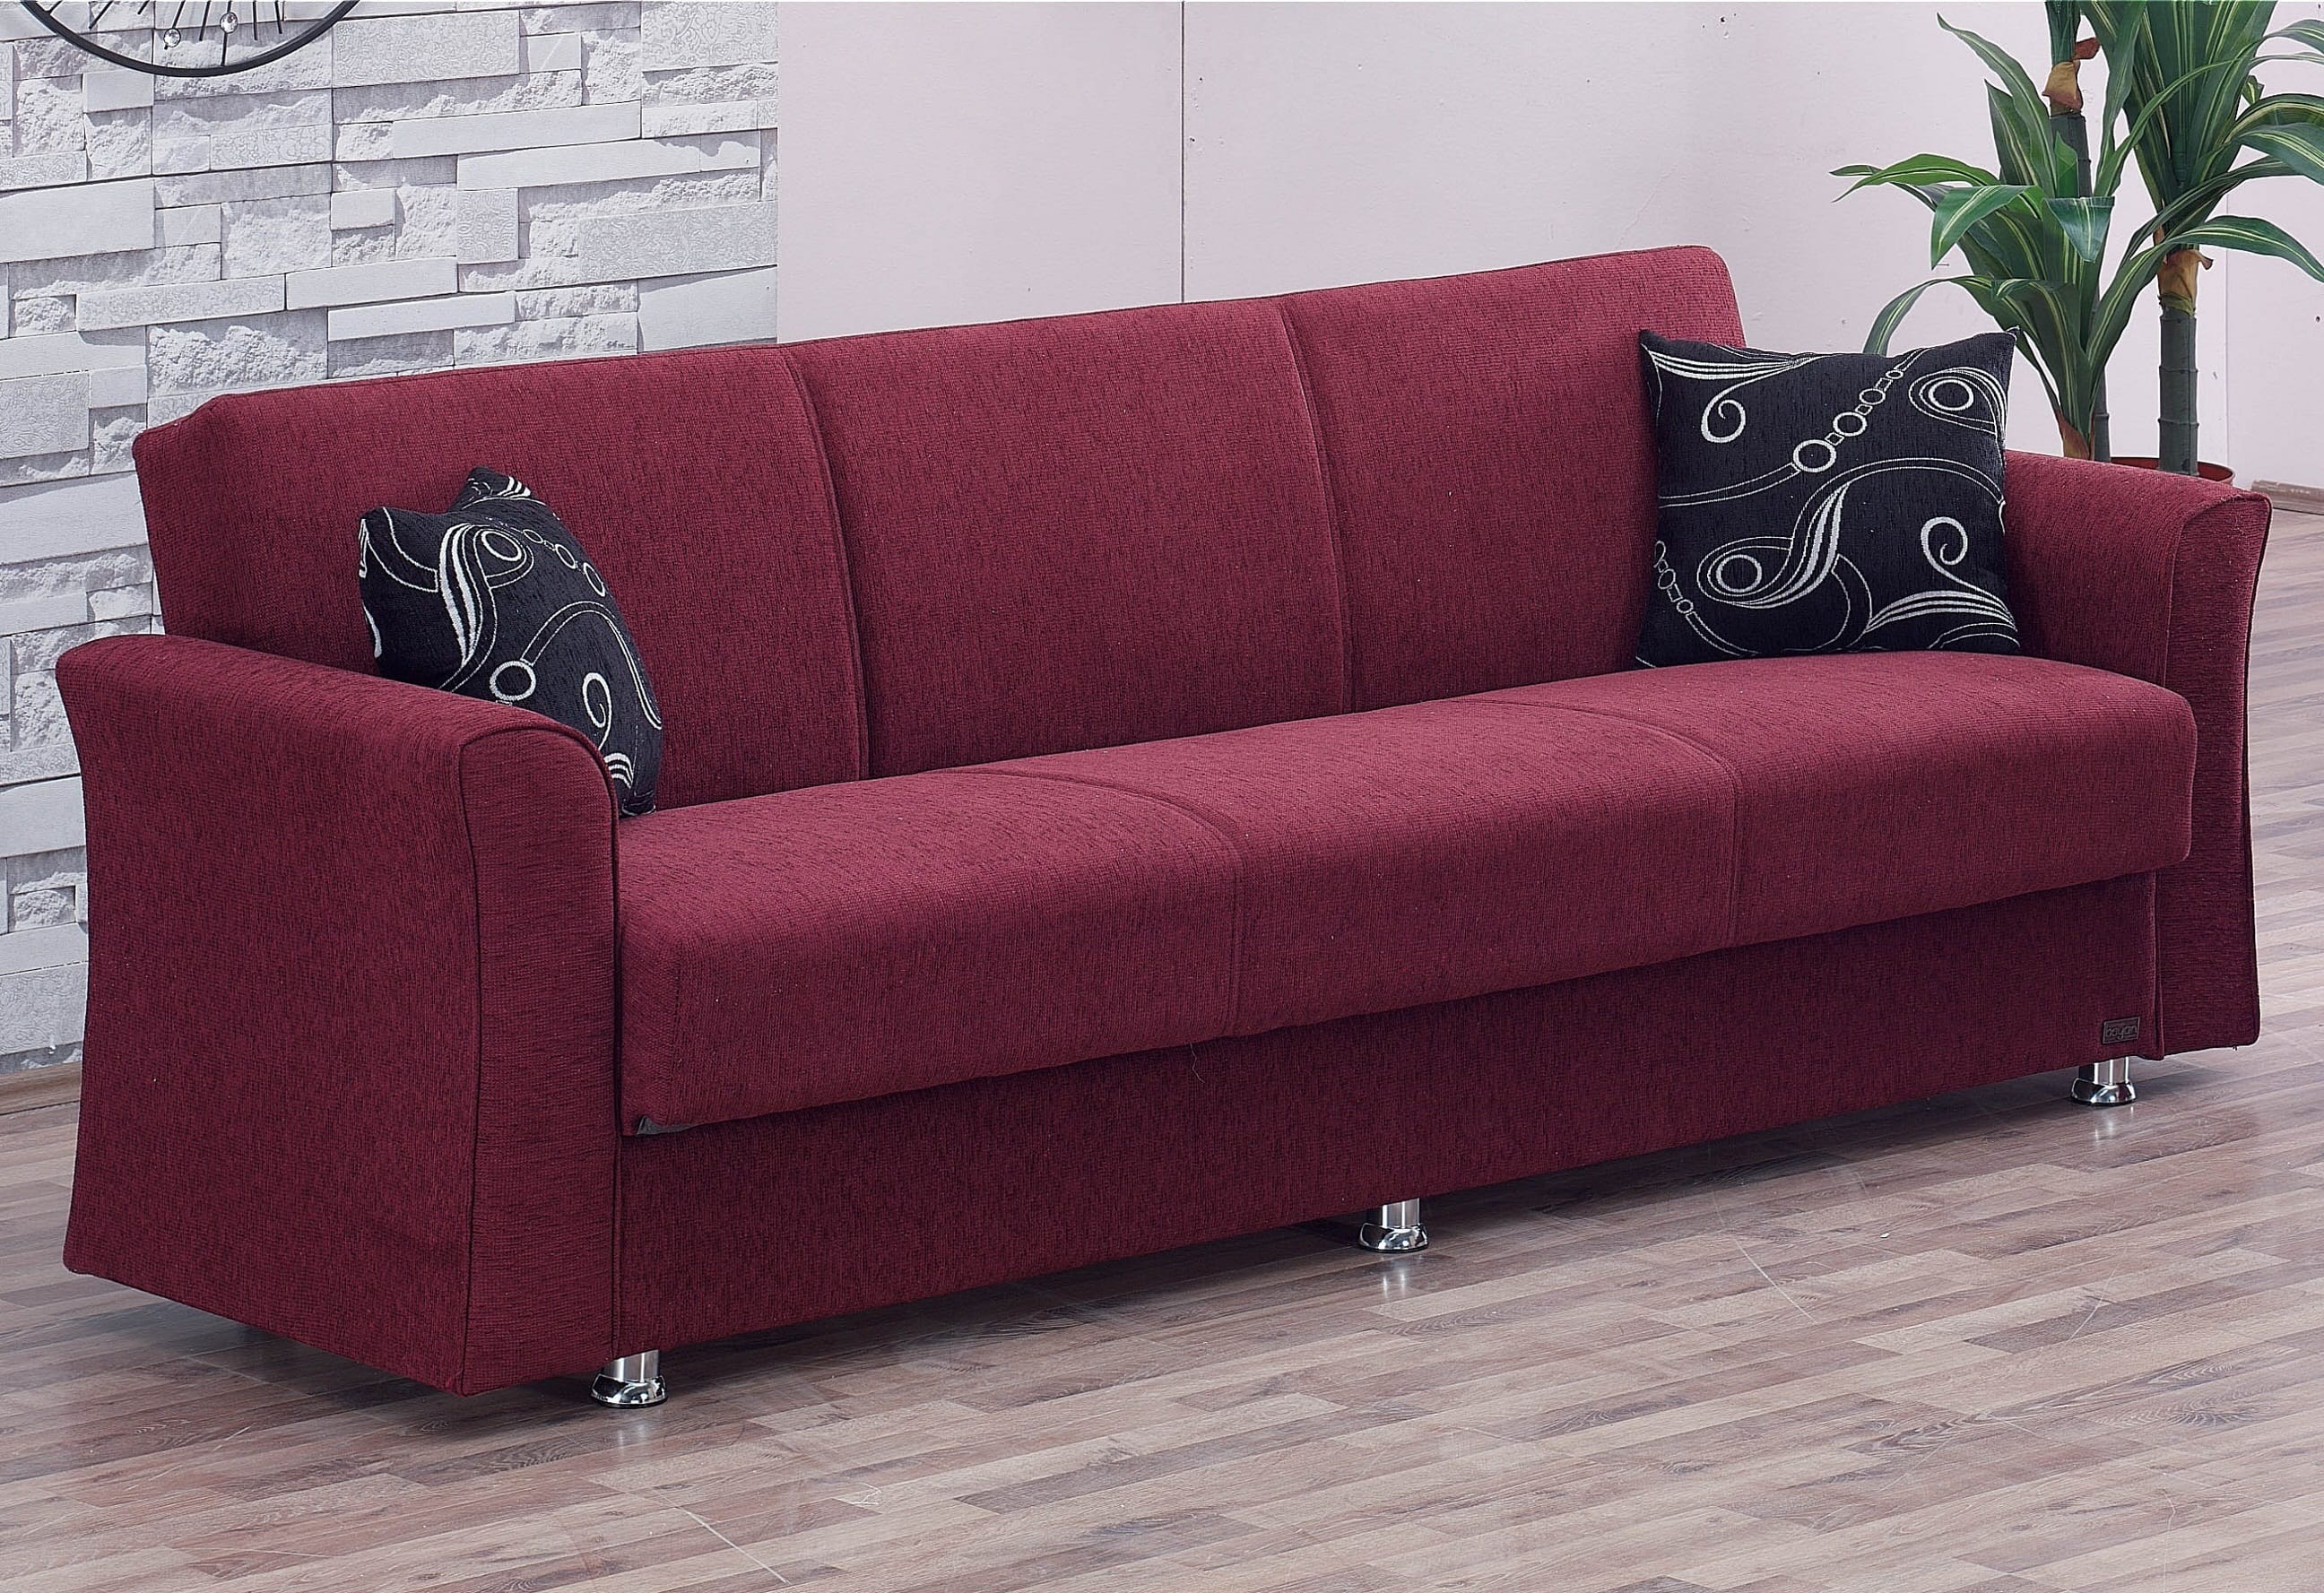 Ohio Sofa Bed by Empire Furniture USA